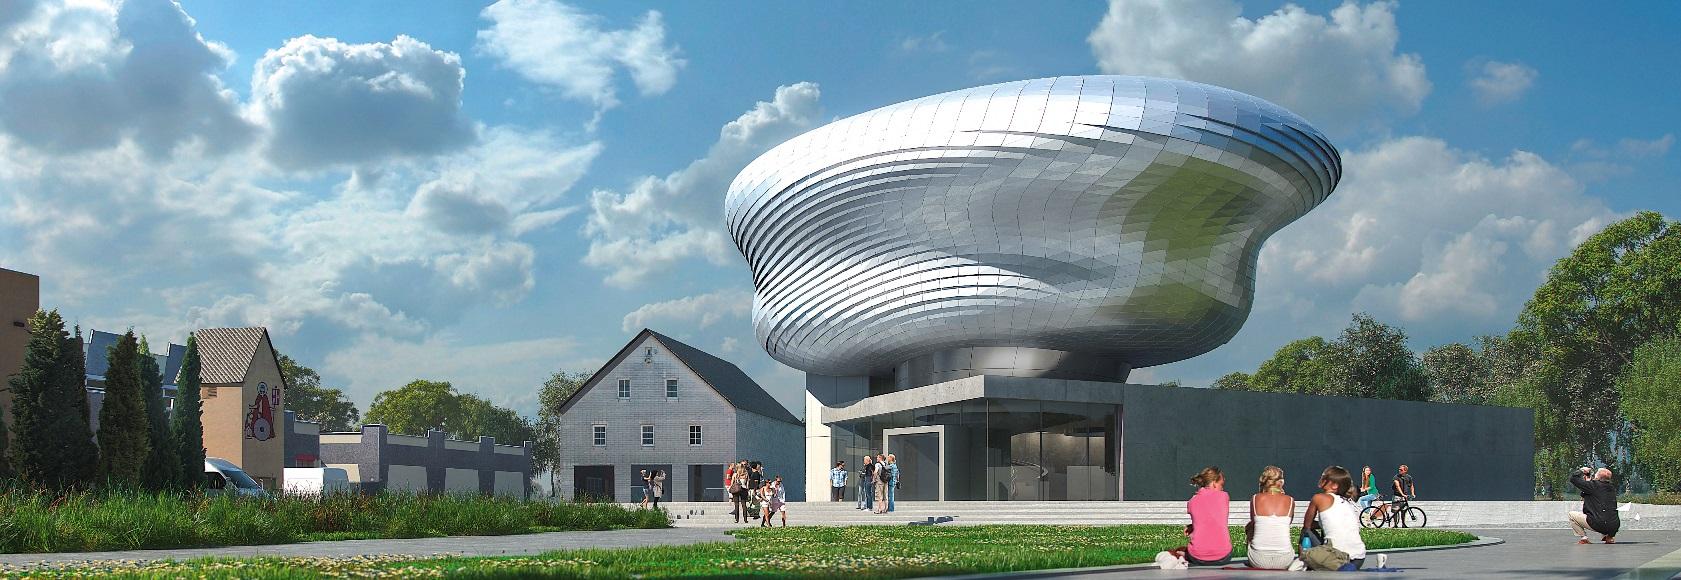 Новая книга — «Архитектура в металле. Фасады»